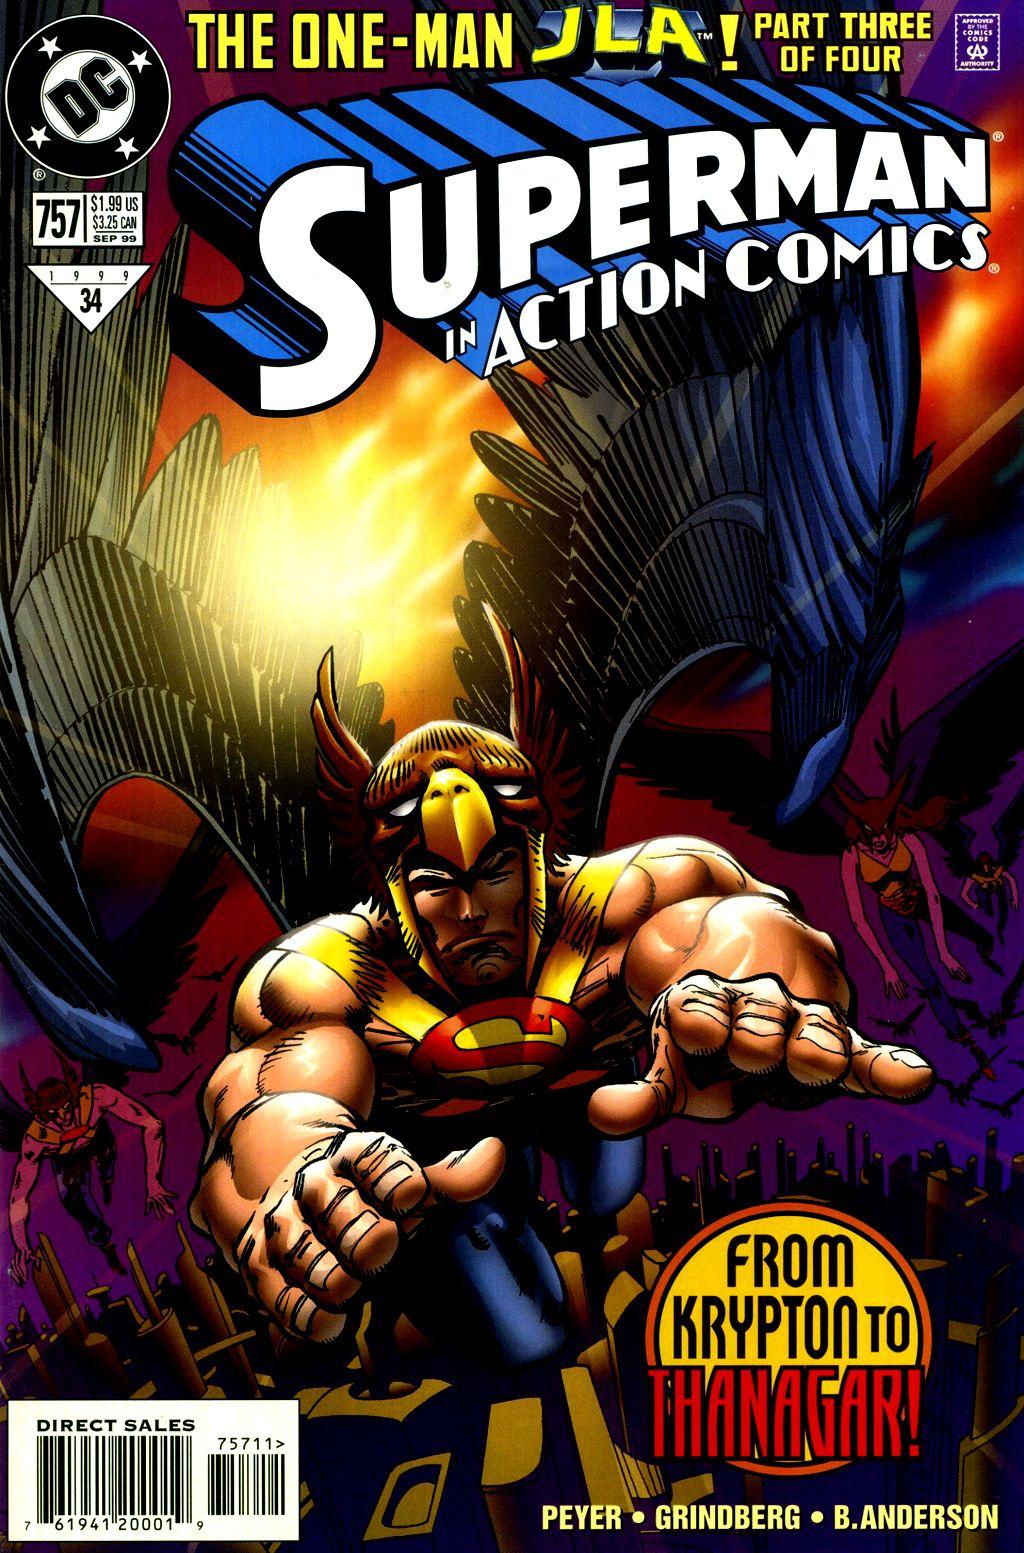 Action Comics (1938) 757 Page 1